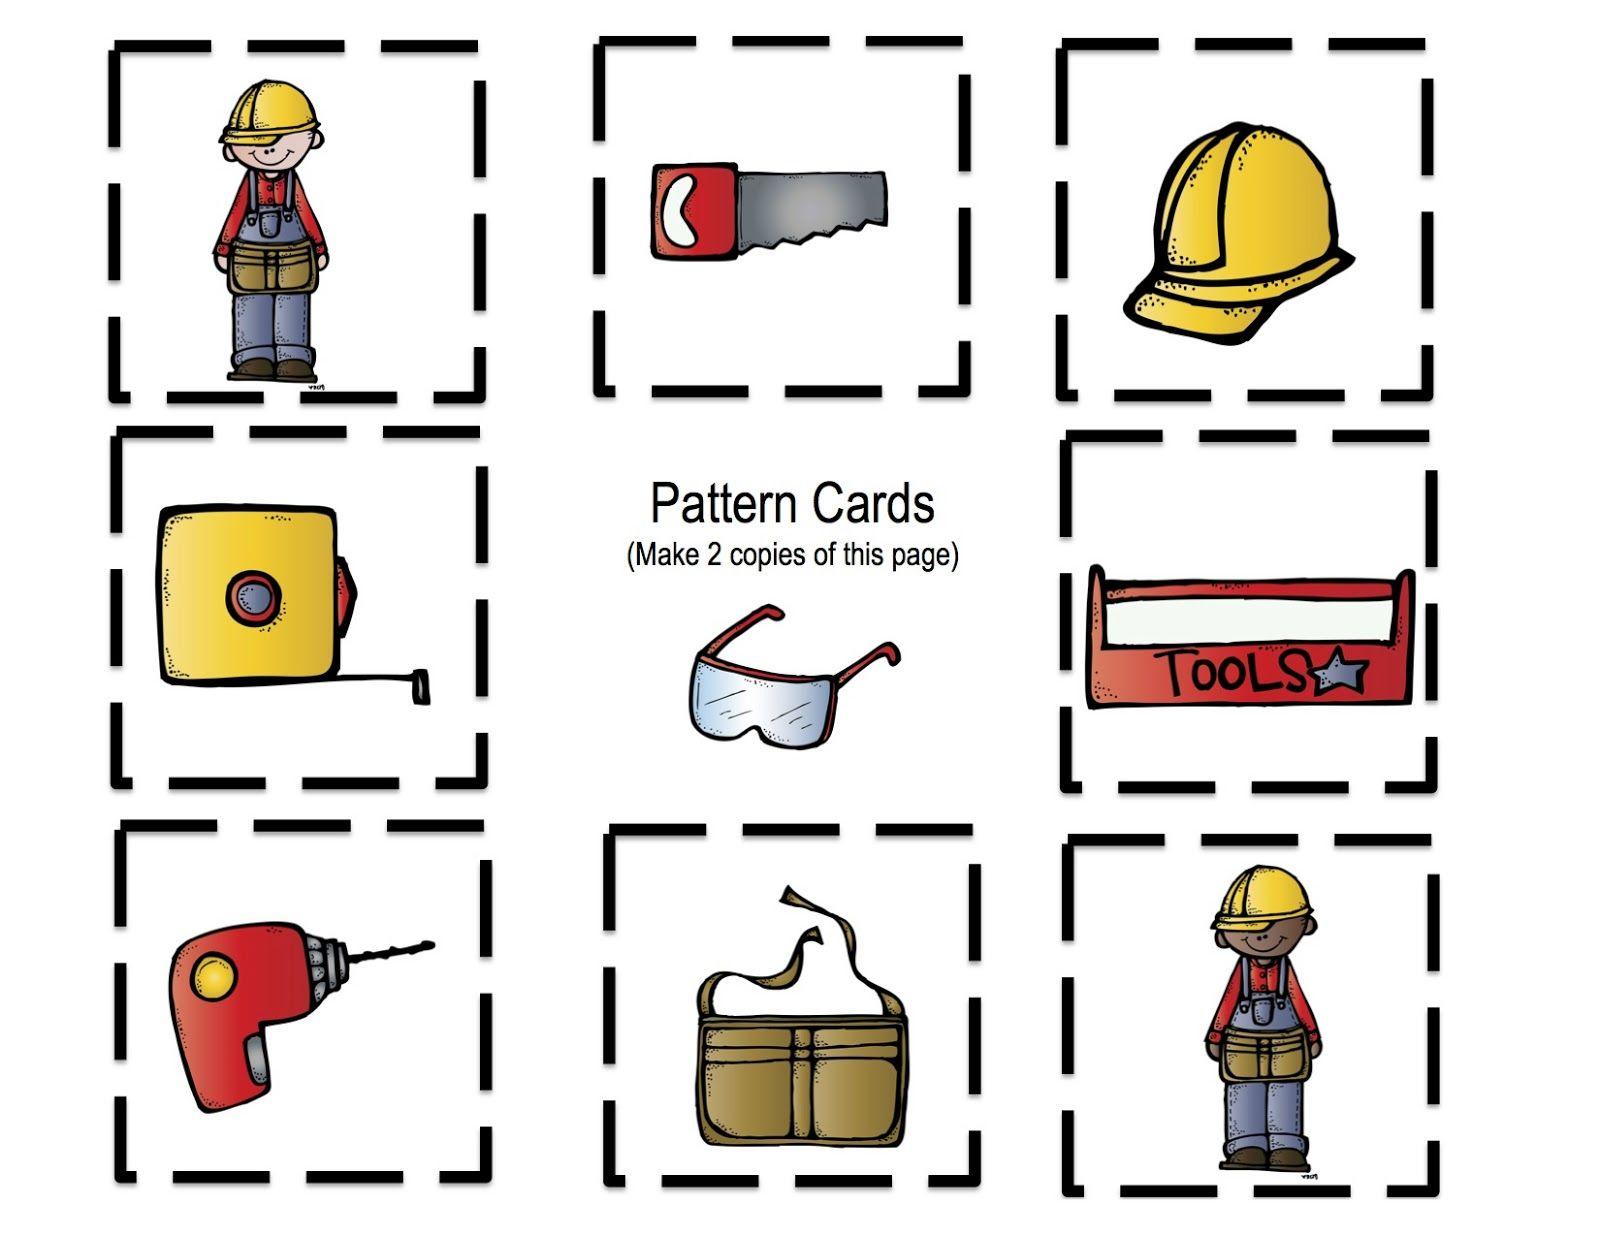 Preschool Printables All About Tools Printable